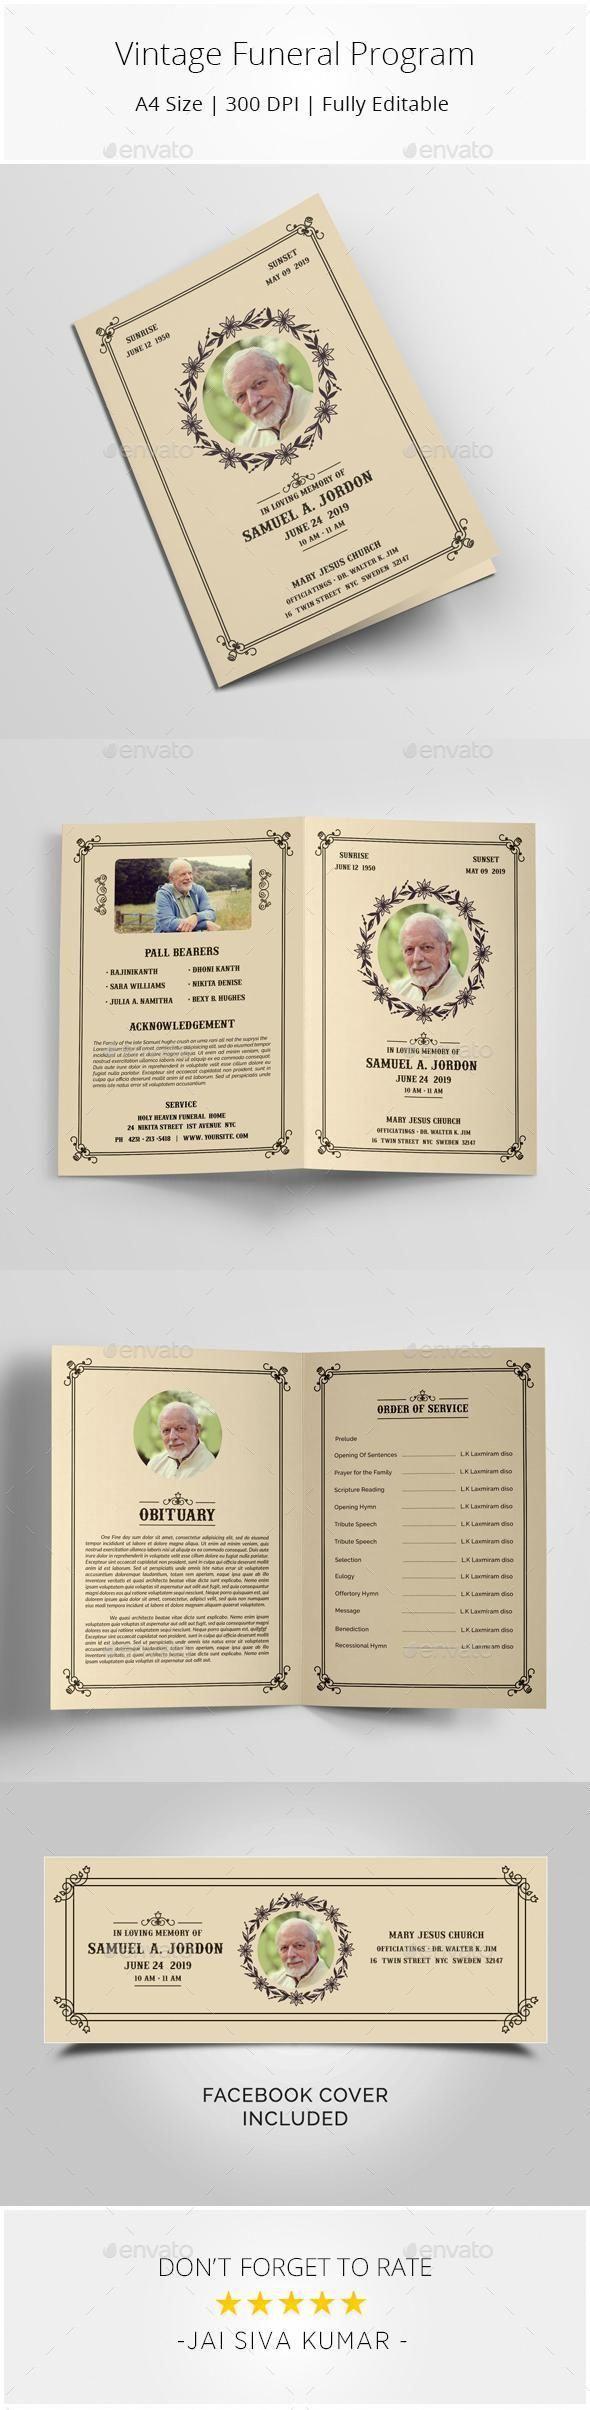 Vintage Funeral Program Template for 9 Envato brochure